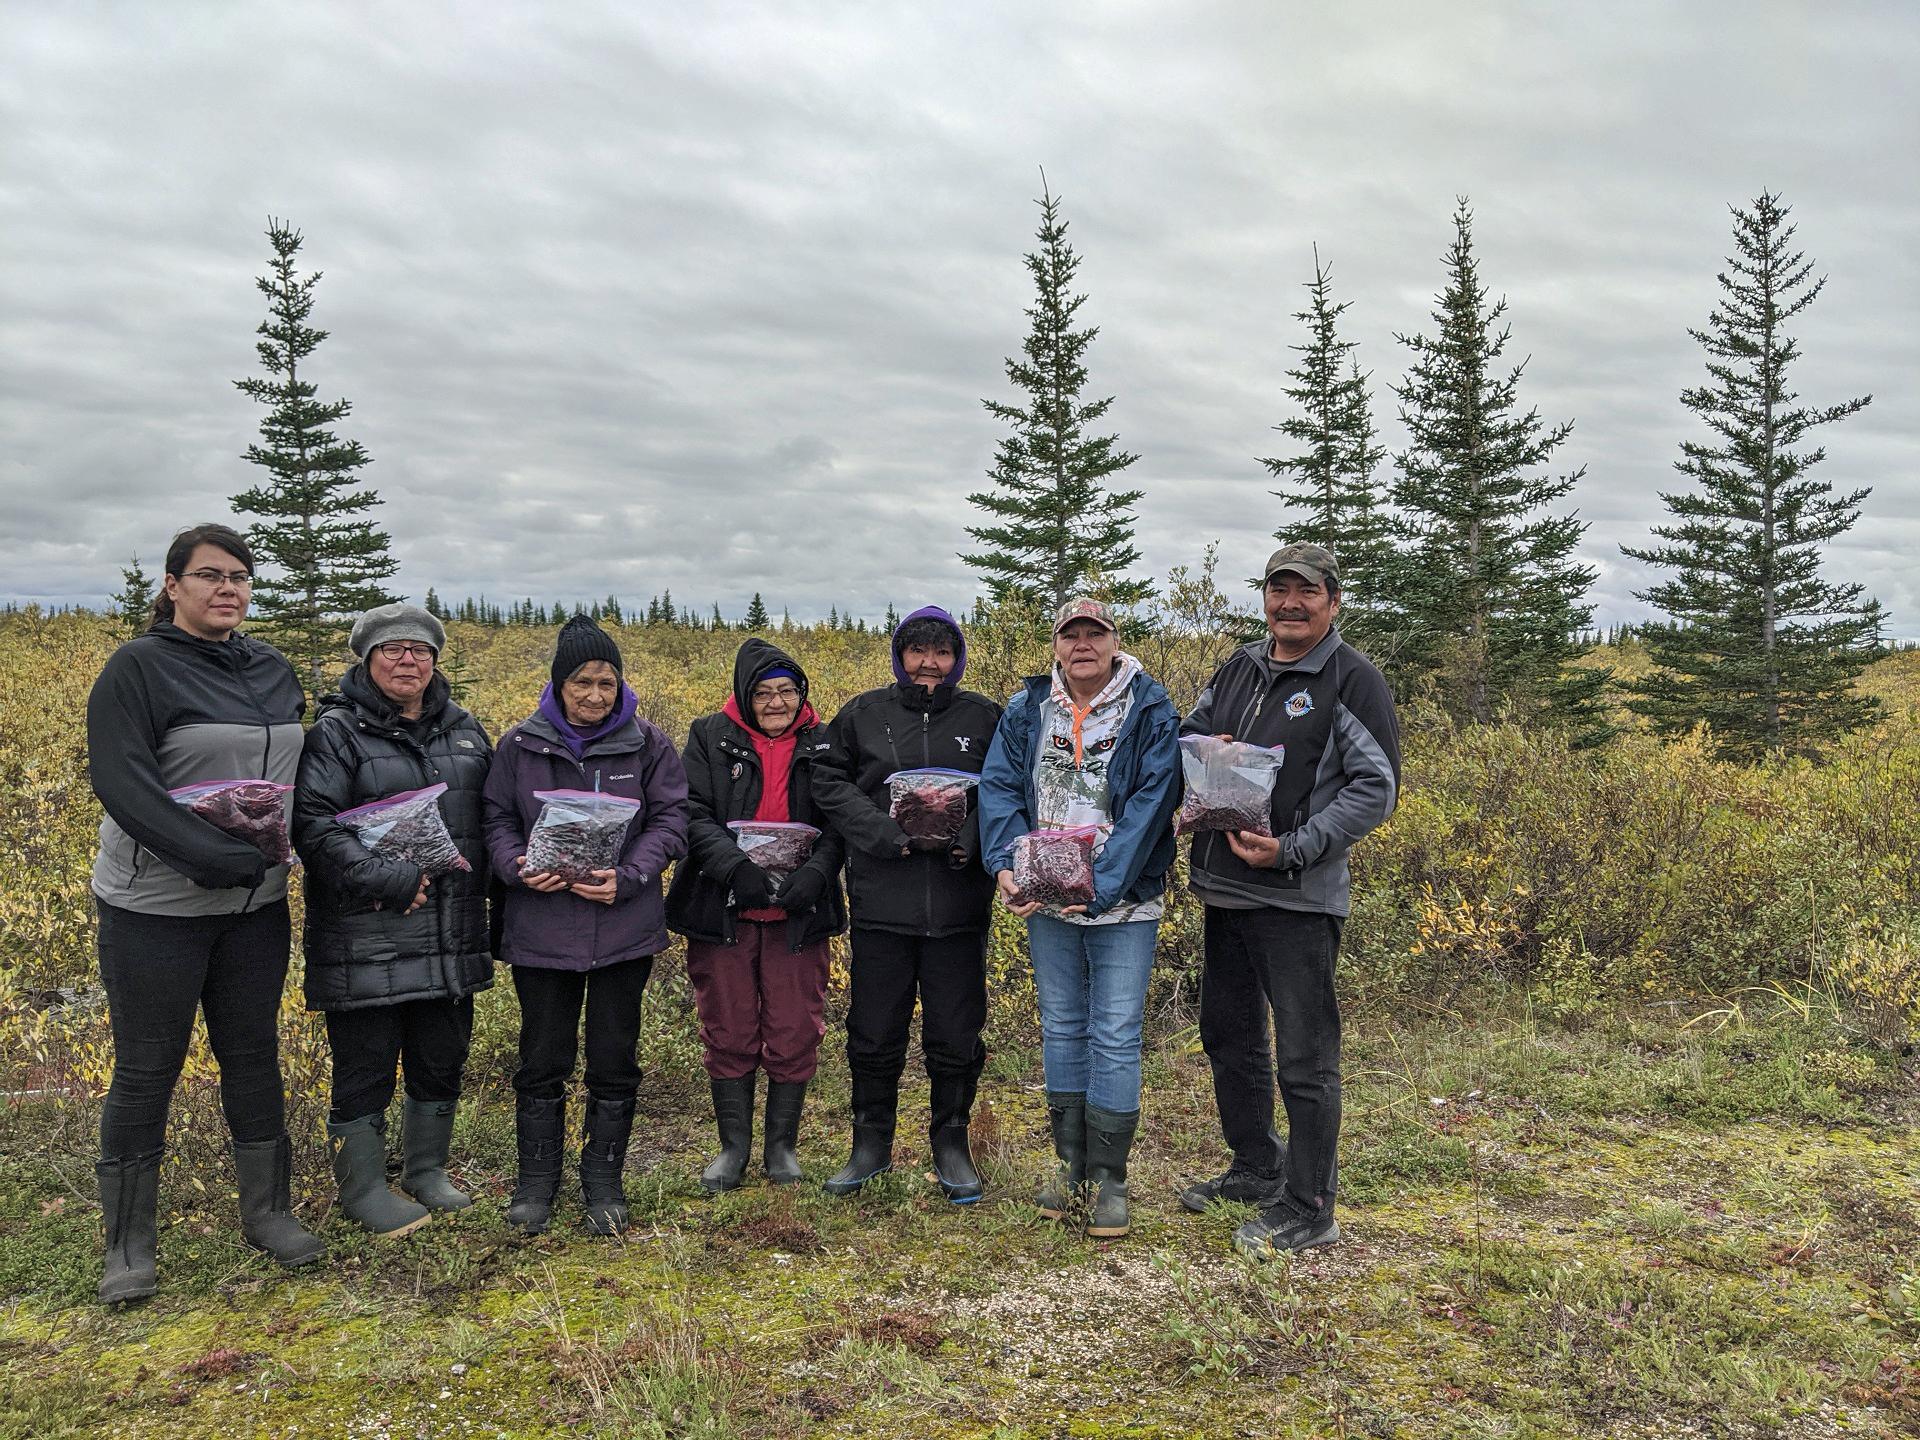 York Factory First Nation (Ininewak) at Nanuk Polar Bear Lodge